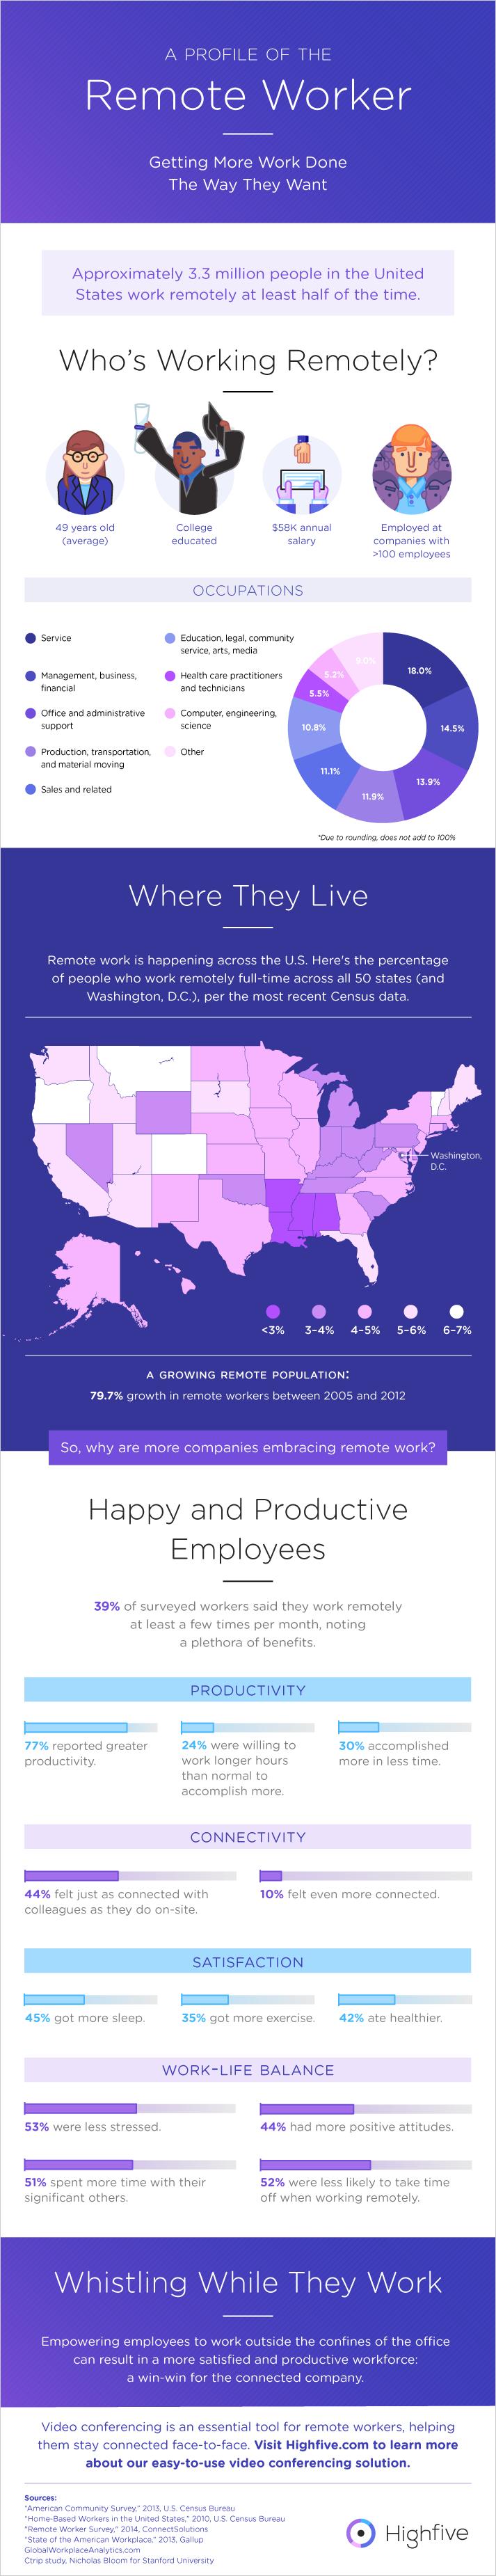 RemoteWork_Infographic